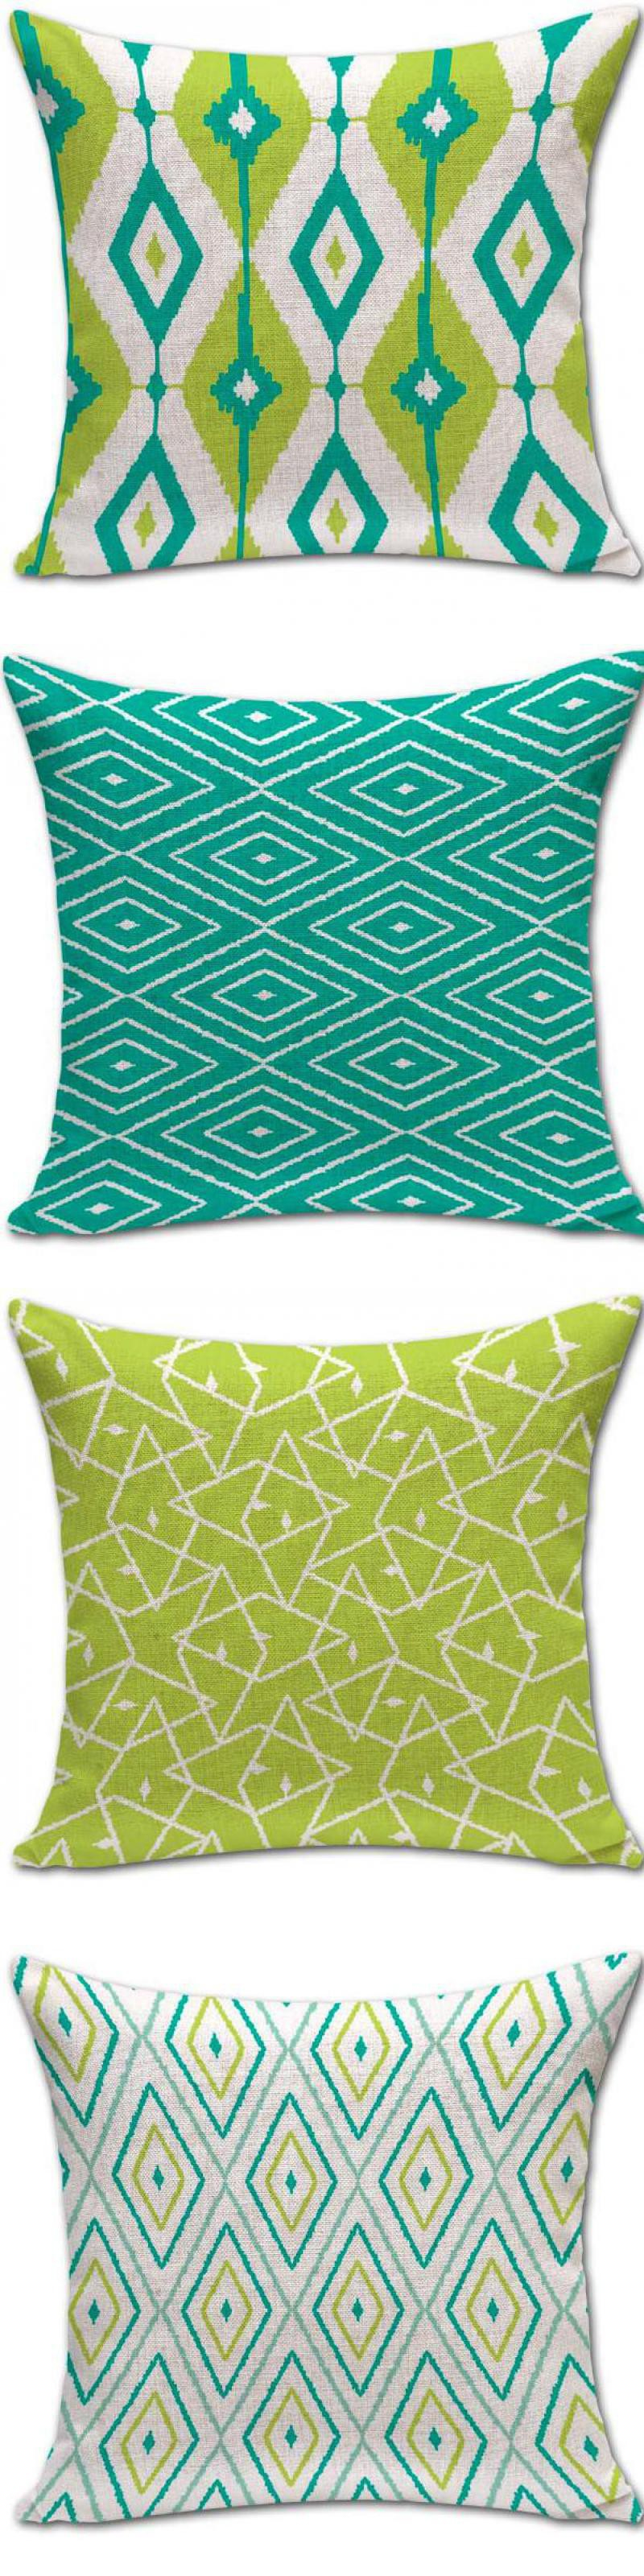 Modern Minimalist Green Diamond Stripe Geometric Cotton Linen Cushion Home Decorative Sofa Chair Seat Cushion $8.66